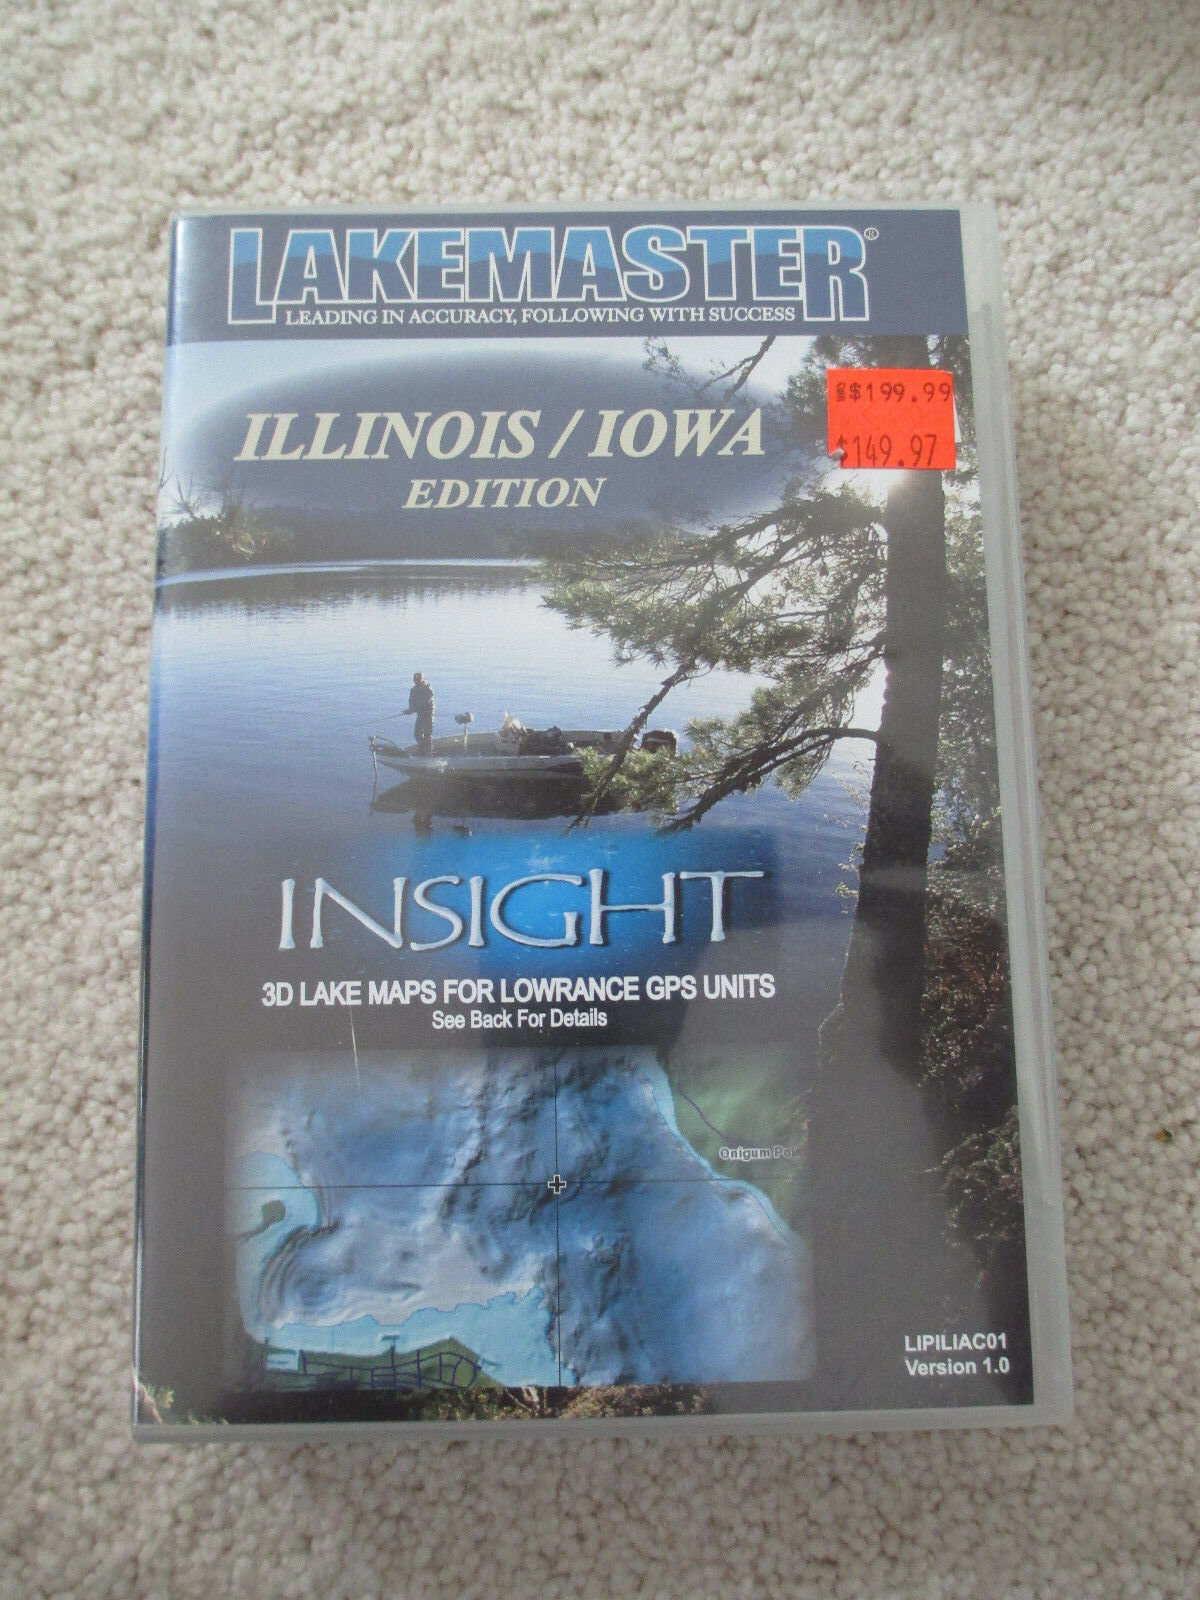 Lakemaster-détaillé GPS Lac Cartes-Illinois and Iowa-Insight petit diamètre DATA CARD